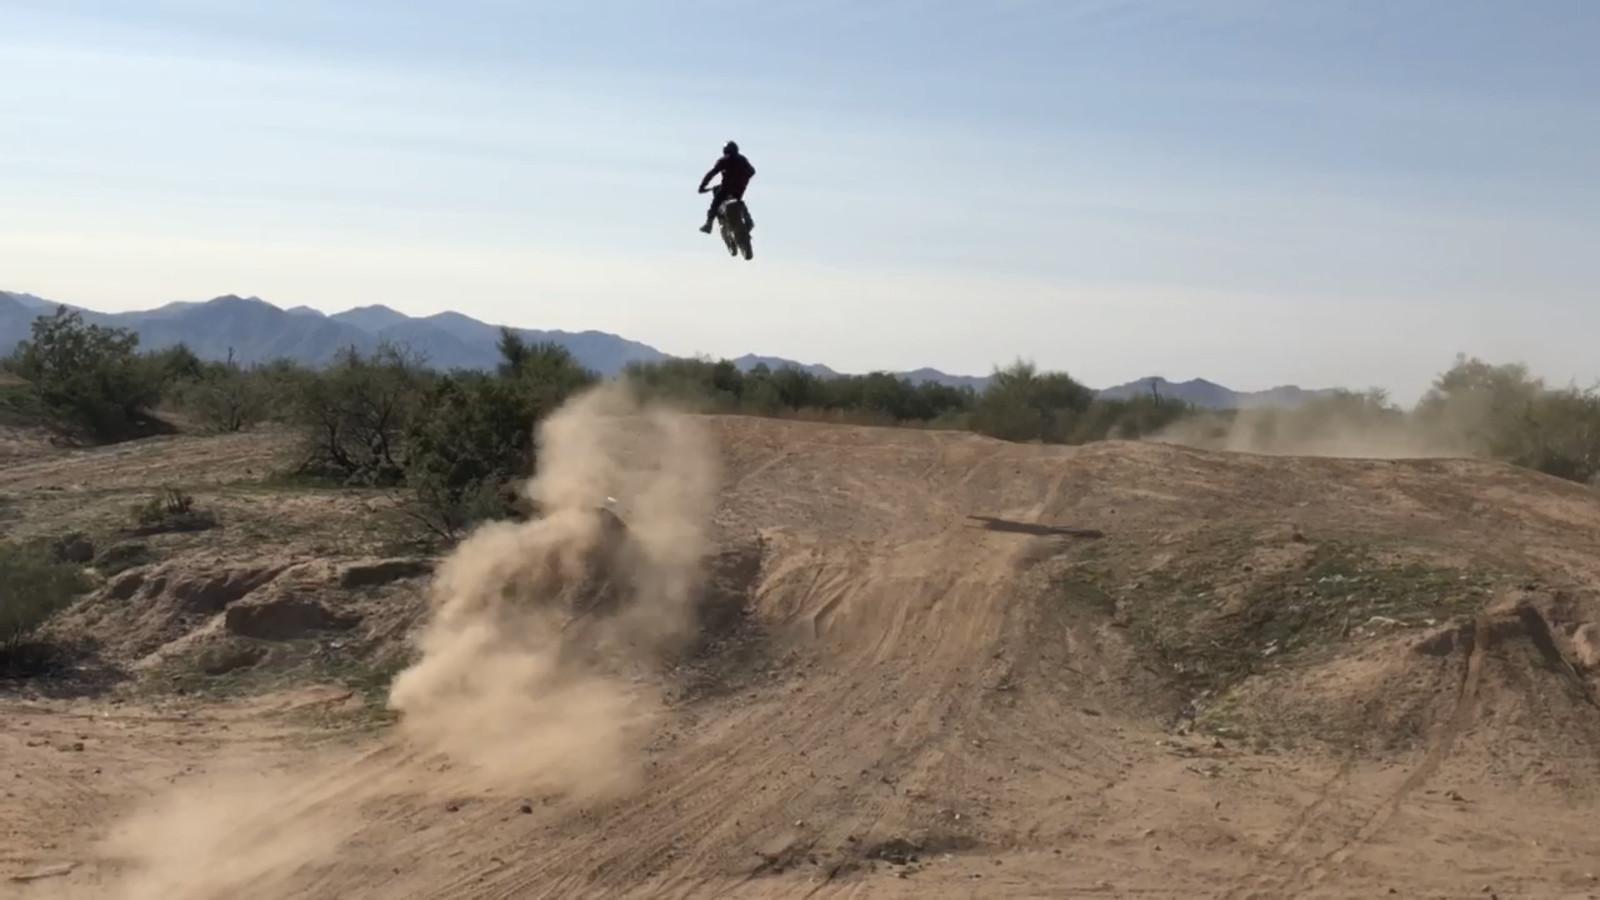 IMG 2215 - buzzlight52 - Motocross Pictures - Vital MX